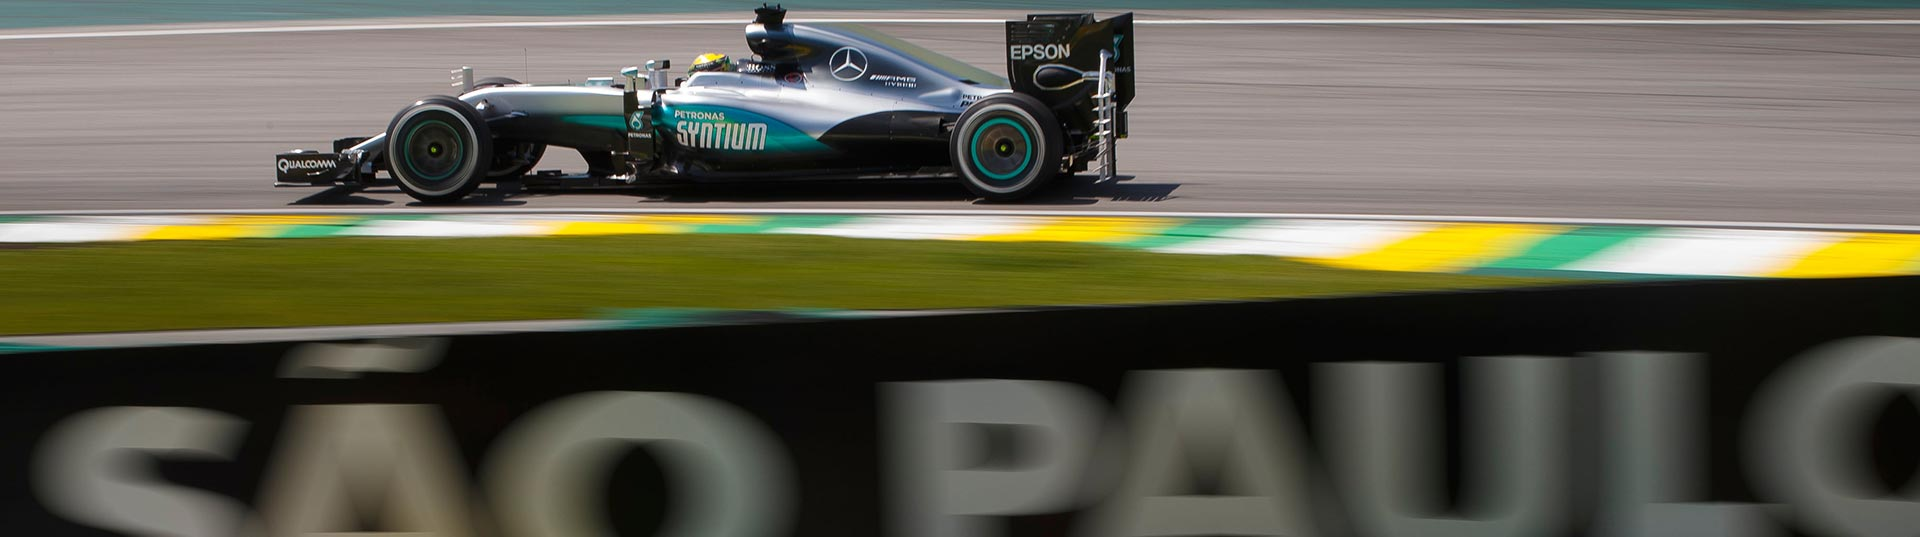 Lewis Hamilton vence GP do Brasil de F1